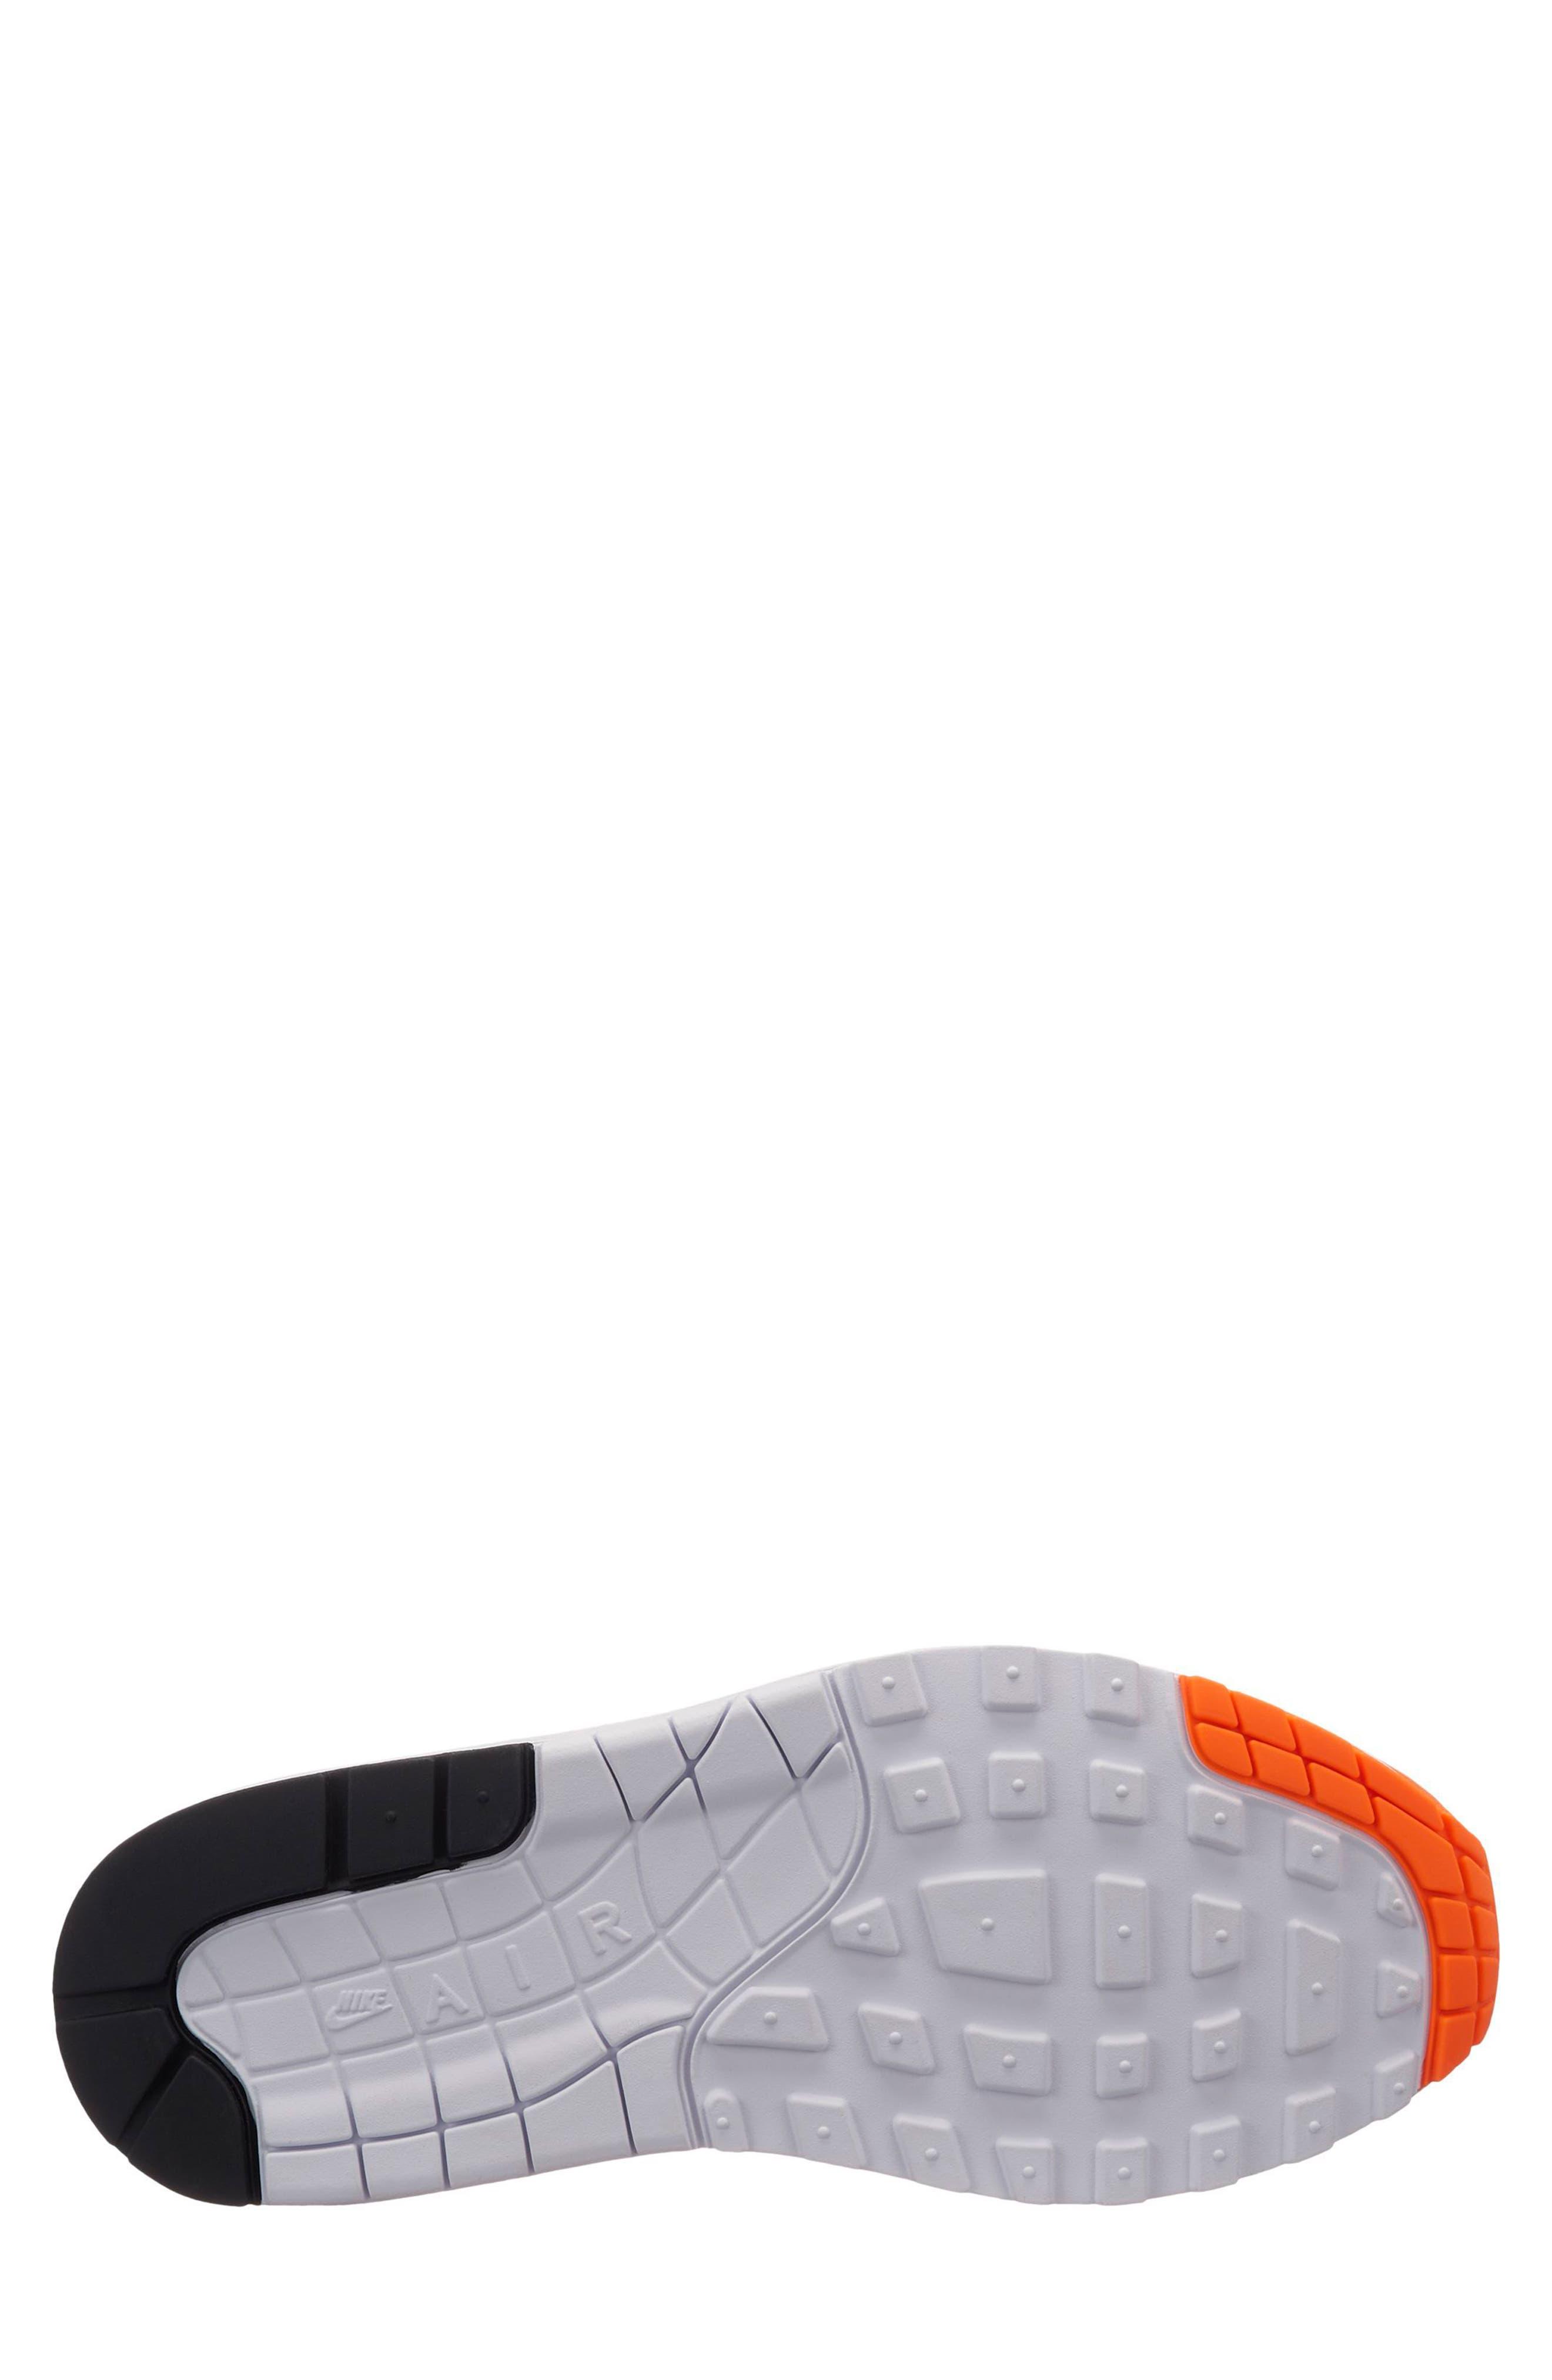 Air Max 1 Lux Sneaker,                             Alternate thumbnail 2, color,                             Total Orange/ White-Black